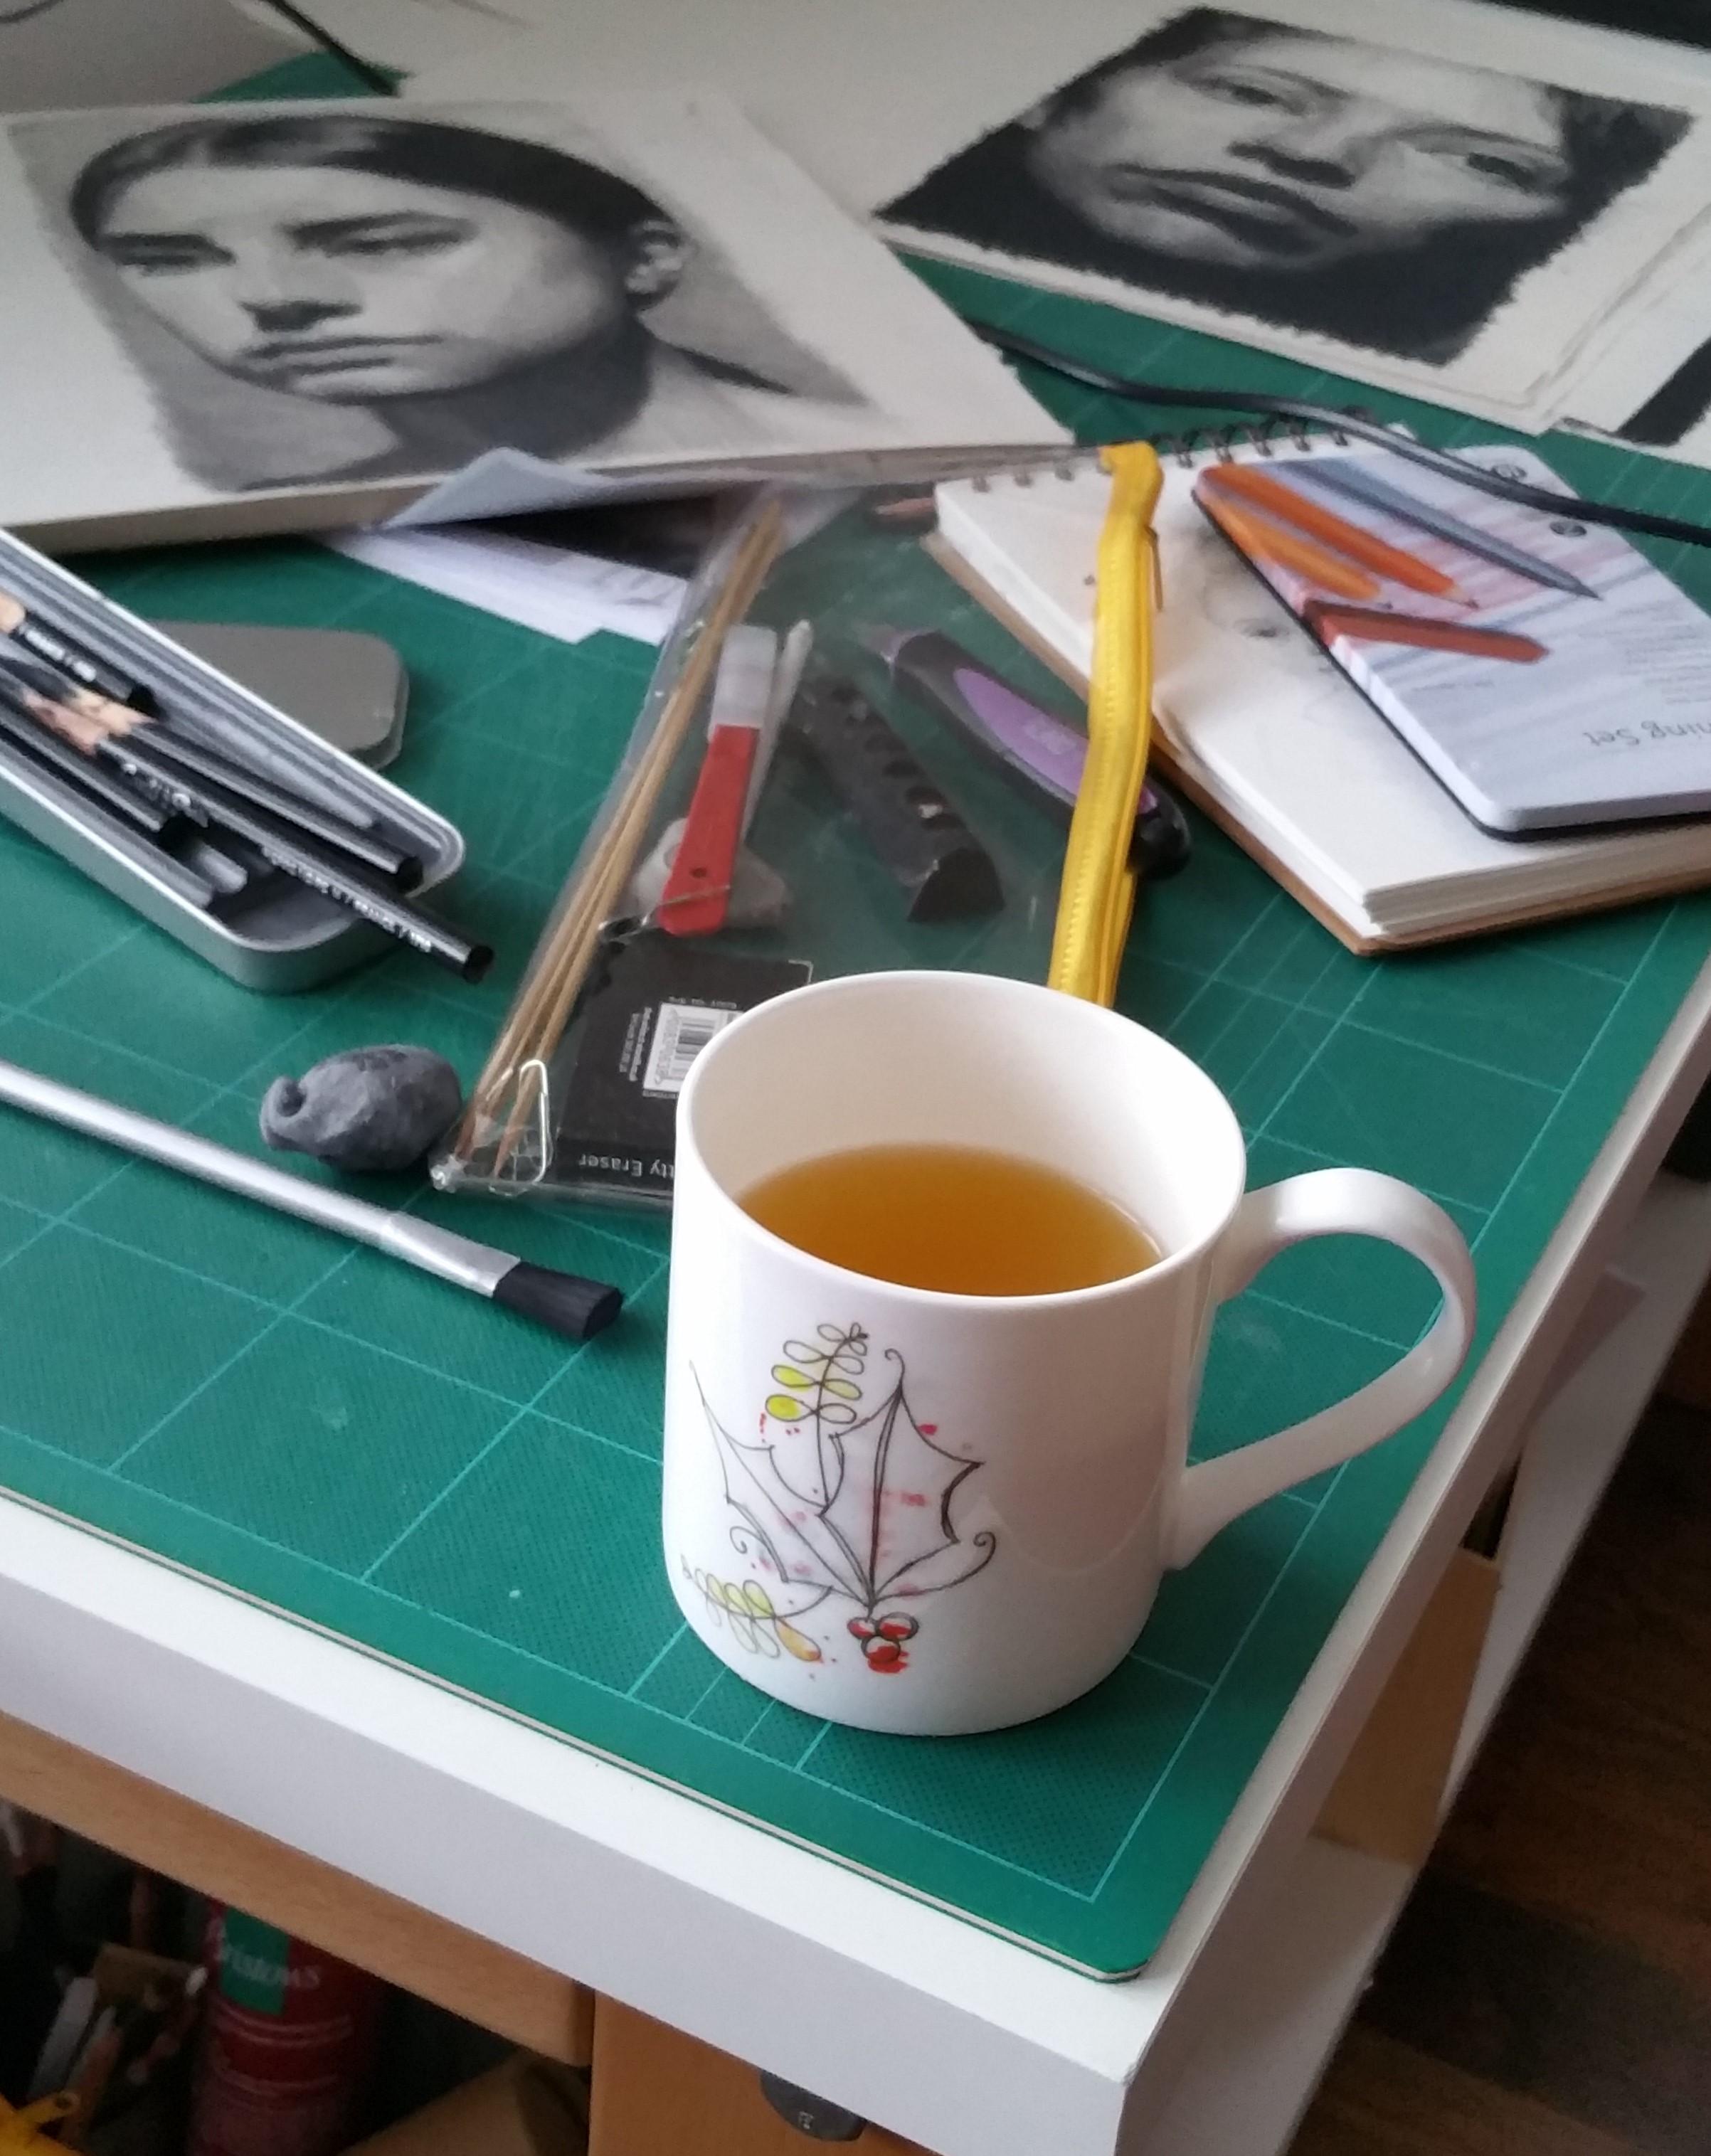 Kate Andrews mug